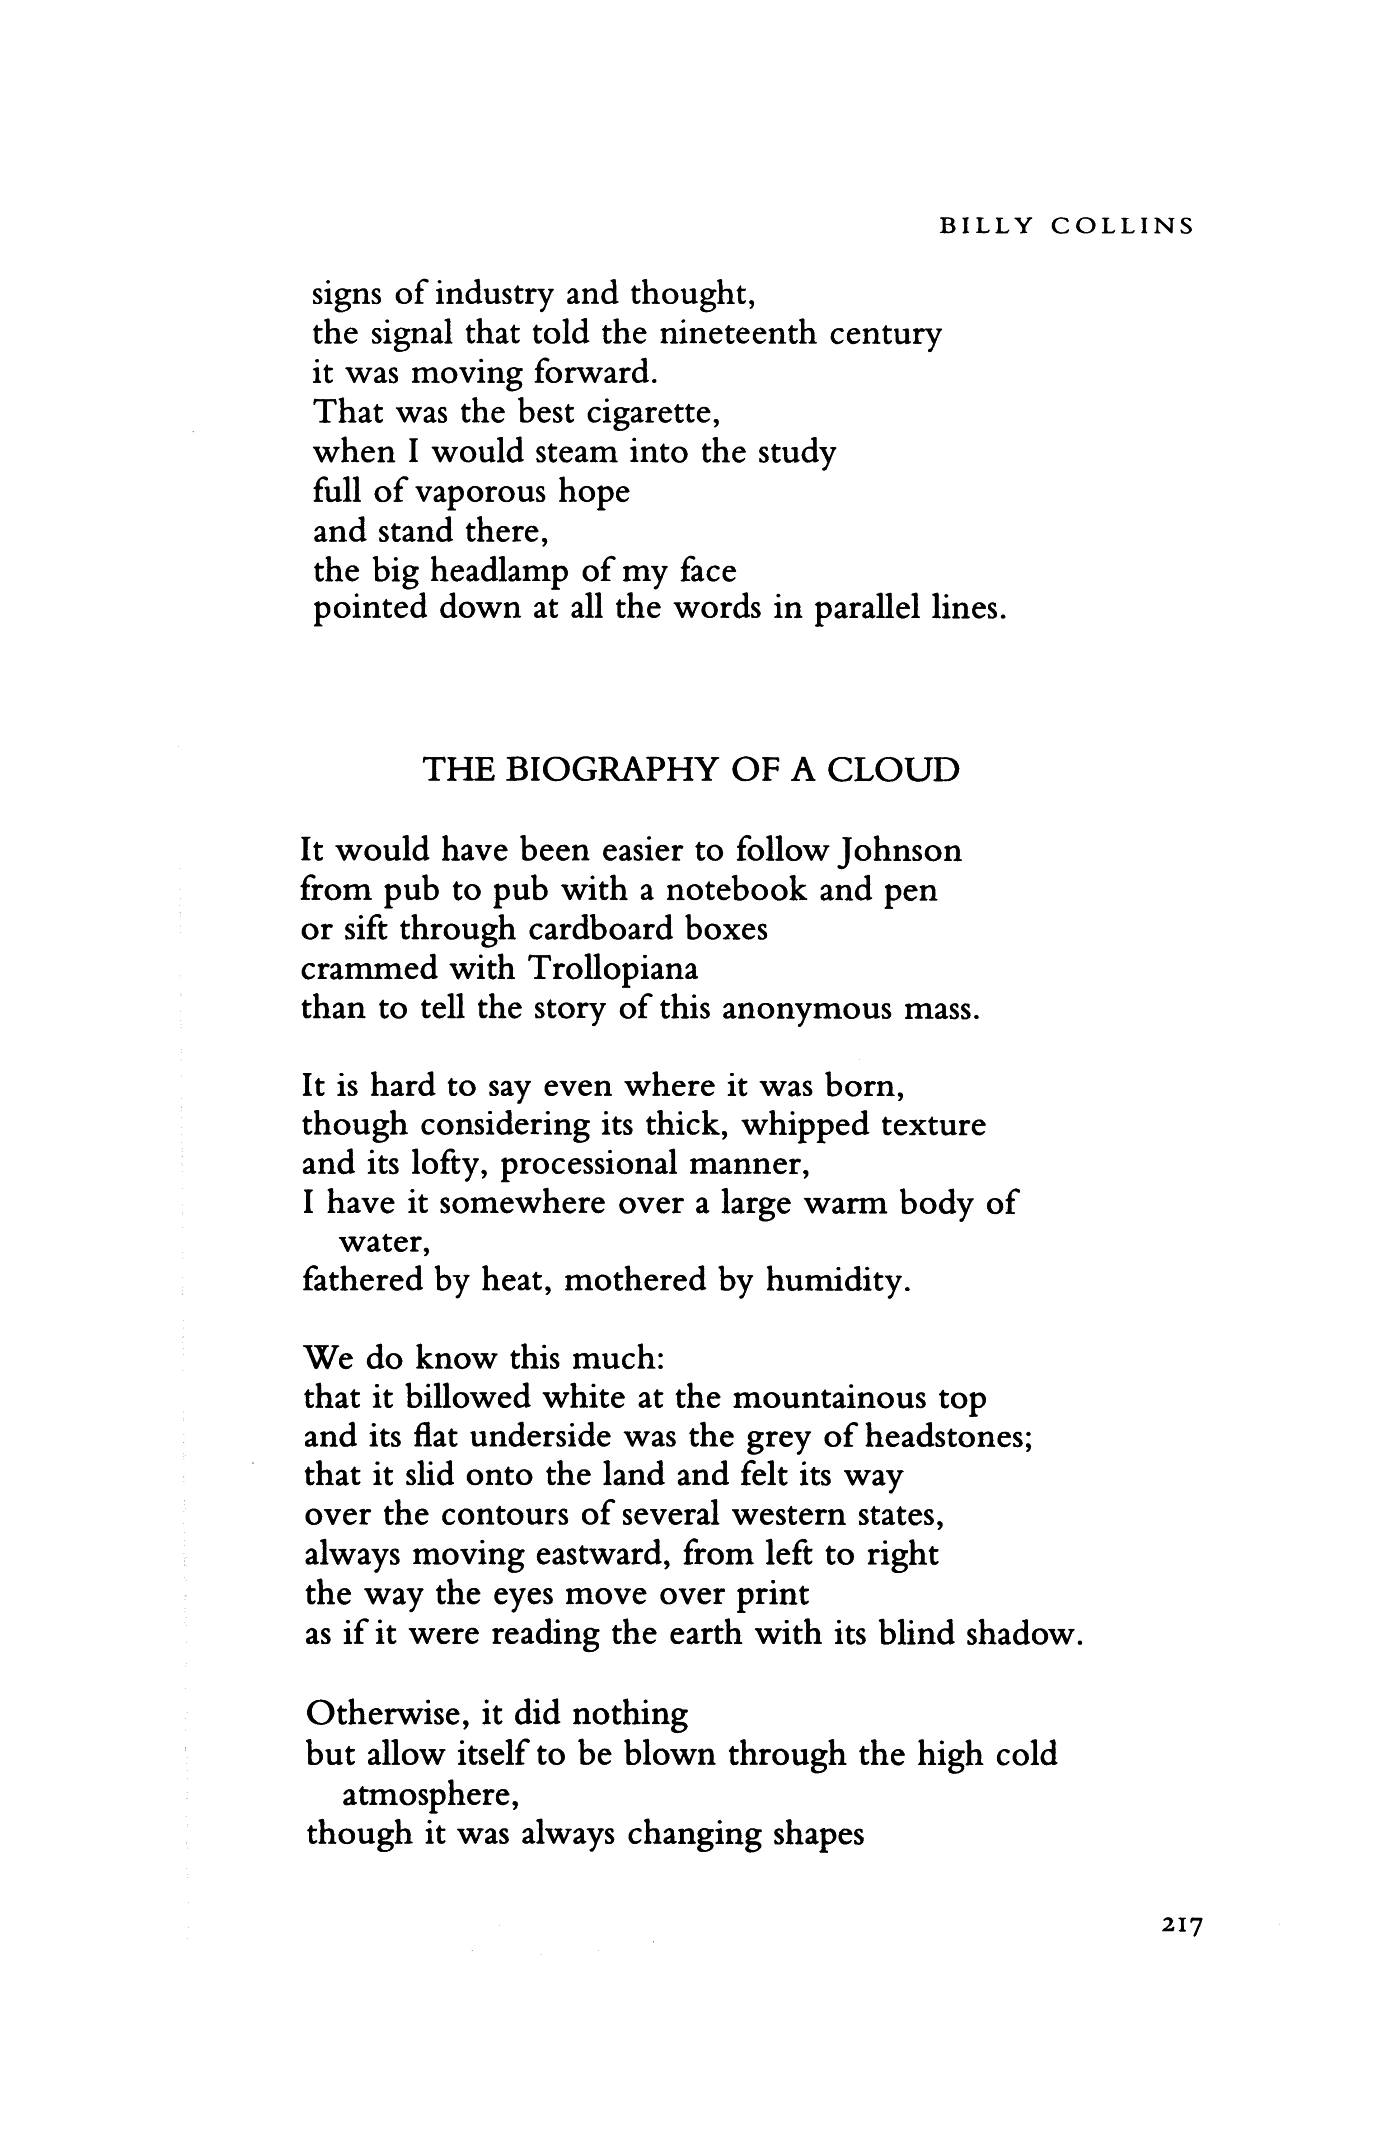 the lanyard poem